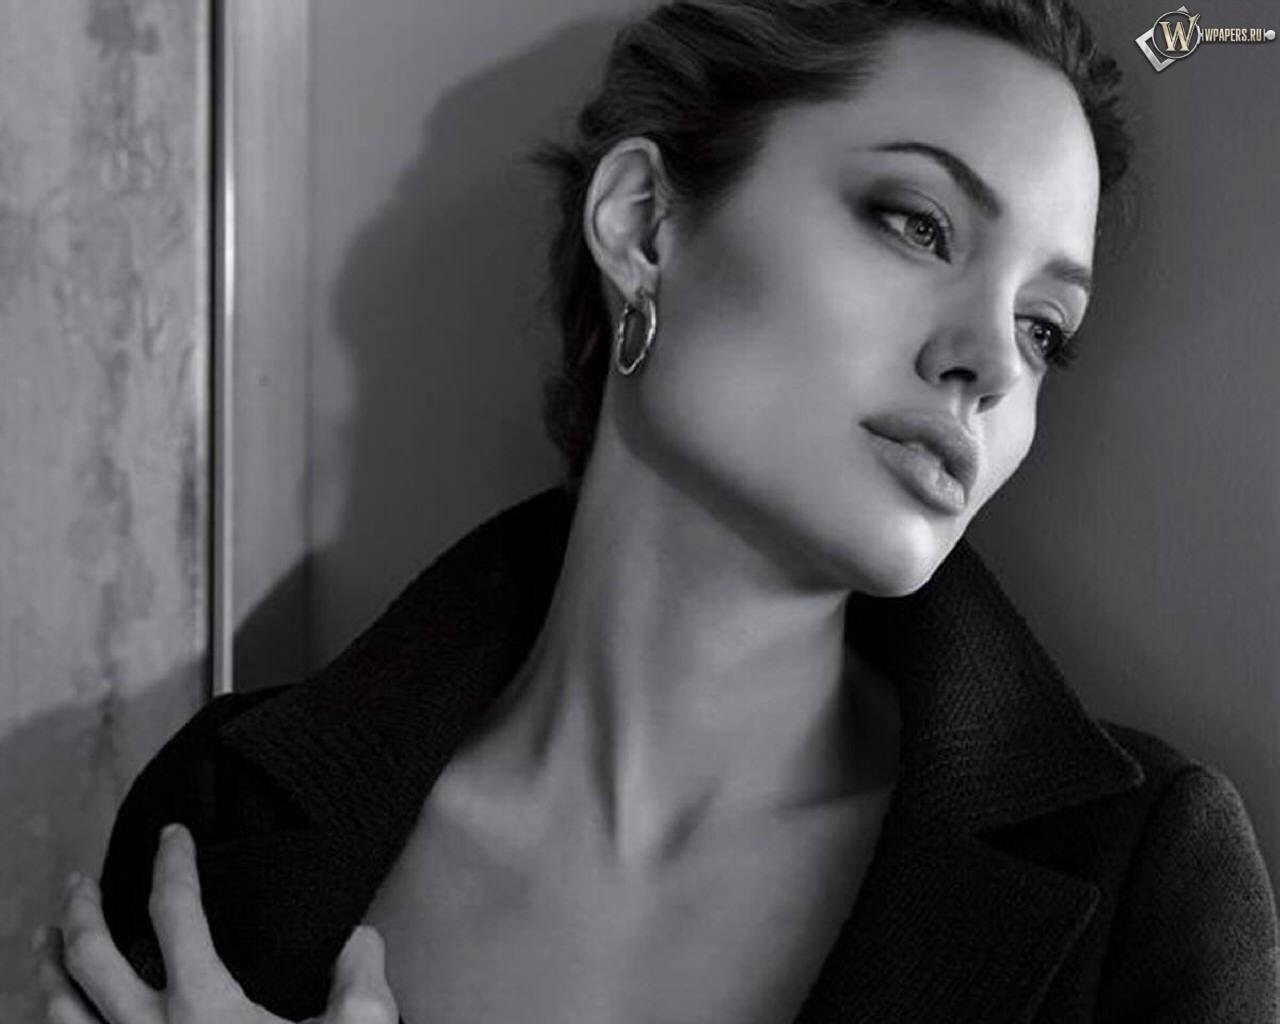 Анджелла Джоли у стены 1280x1024